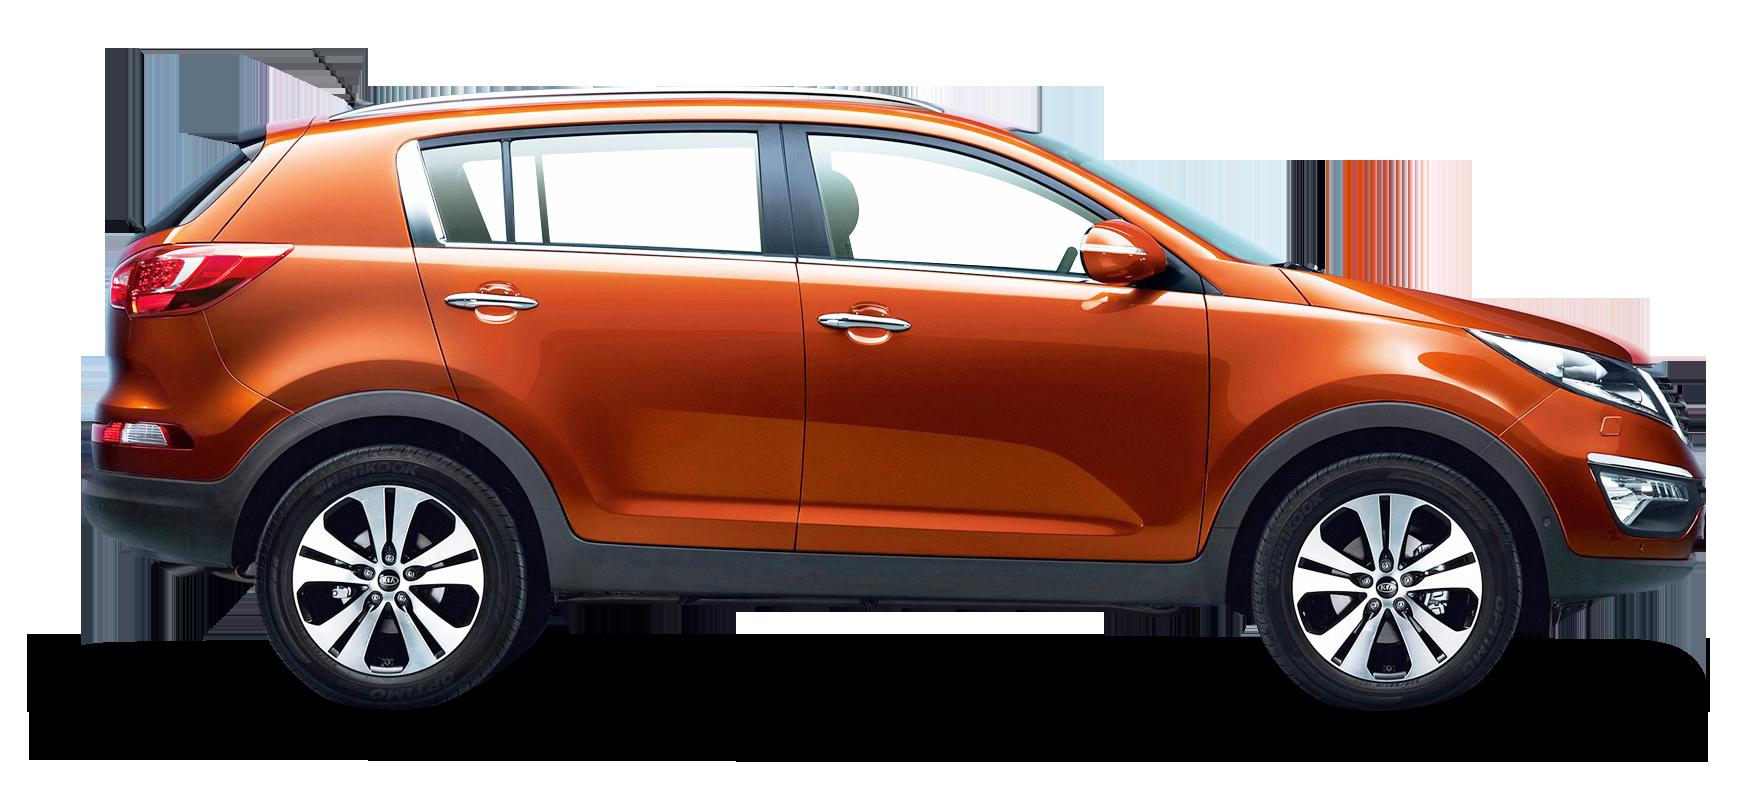 Kia Sportage Orange Car PNG Image